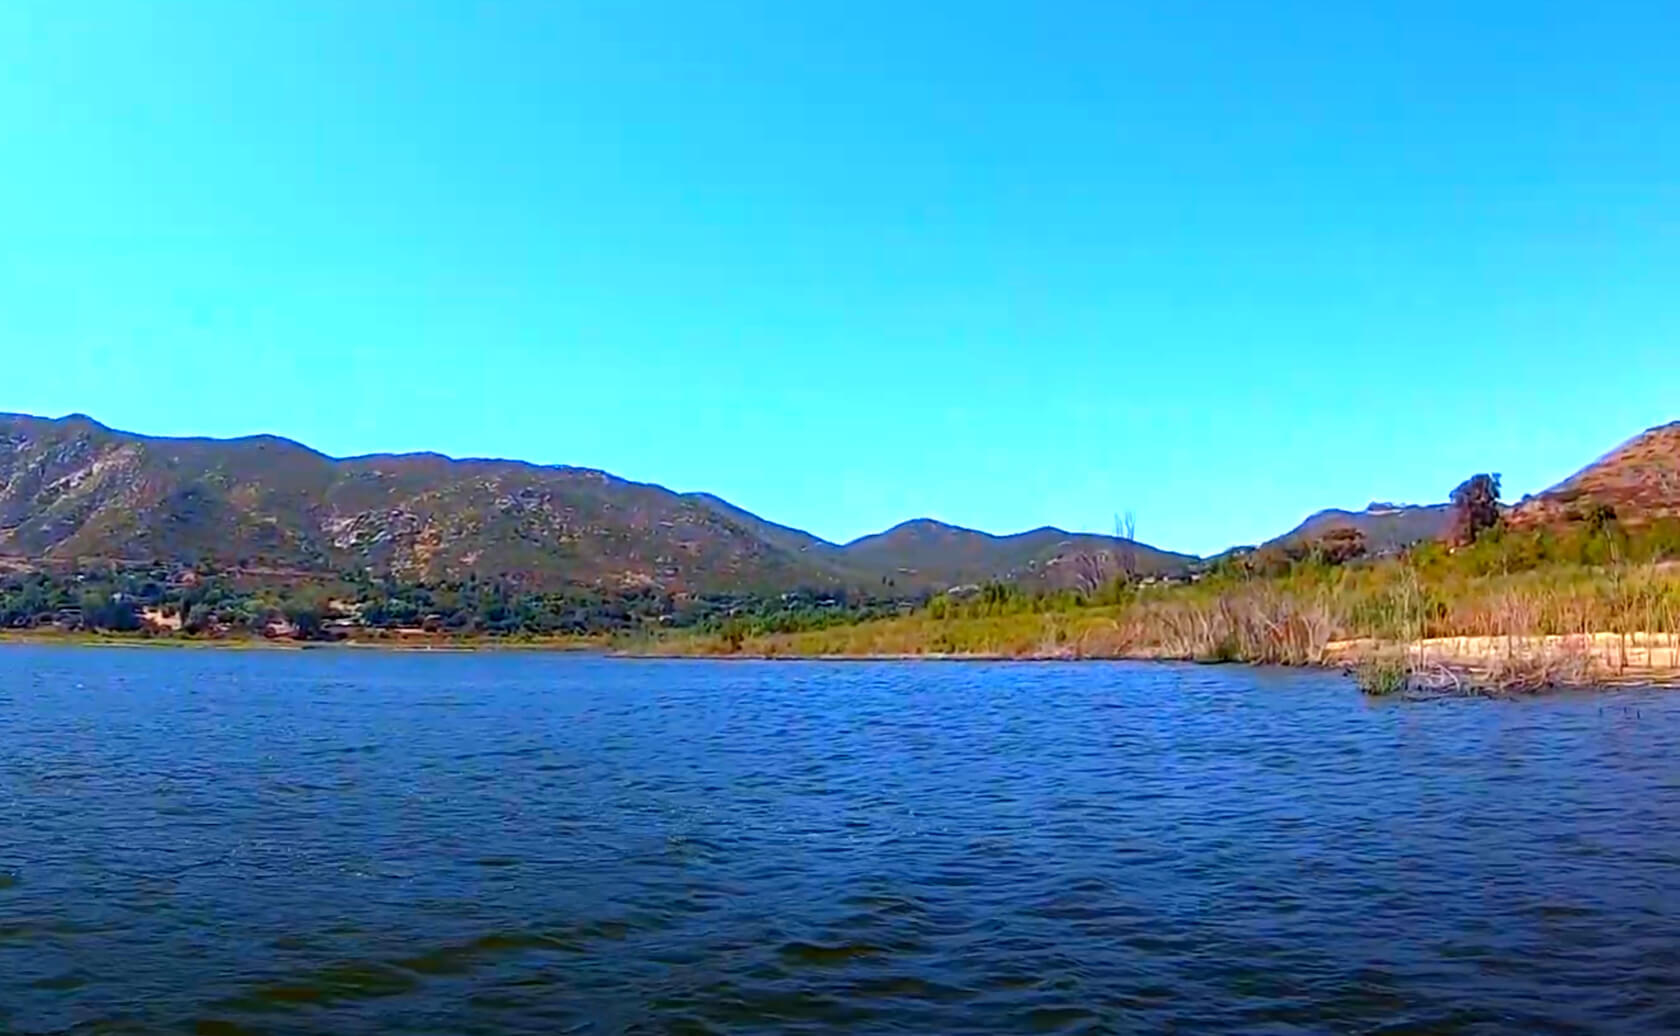 Lake-Hodges-Fishing-Guide-Report-San-Deigo-CA-06